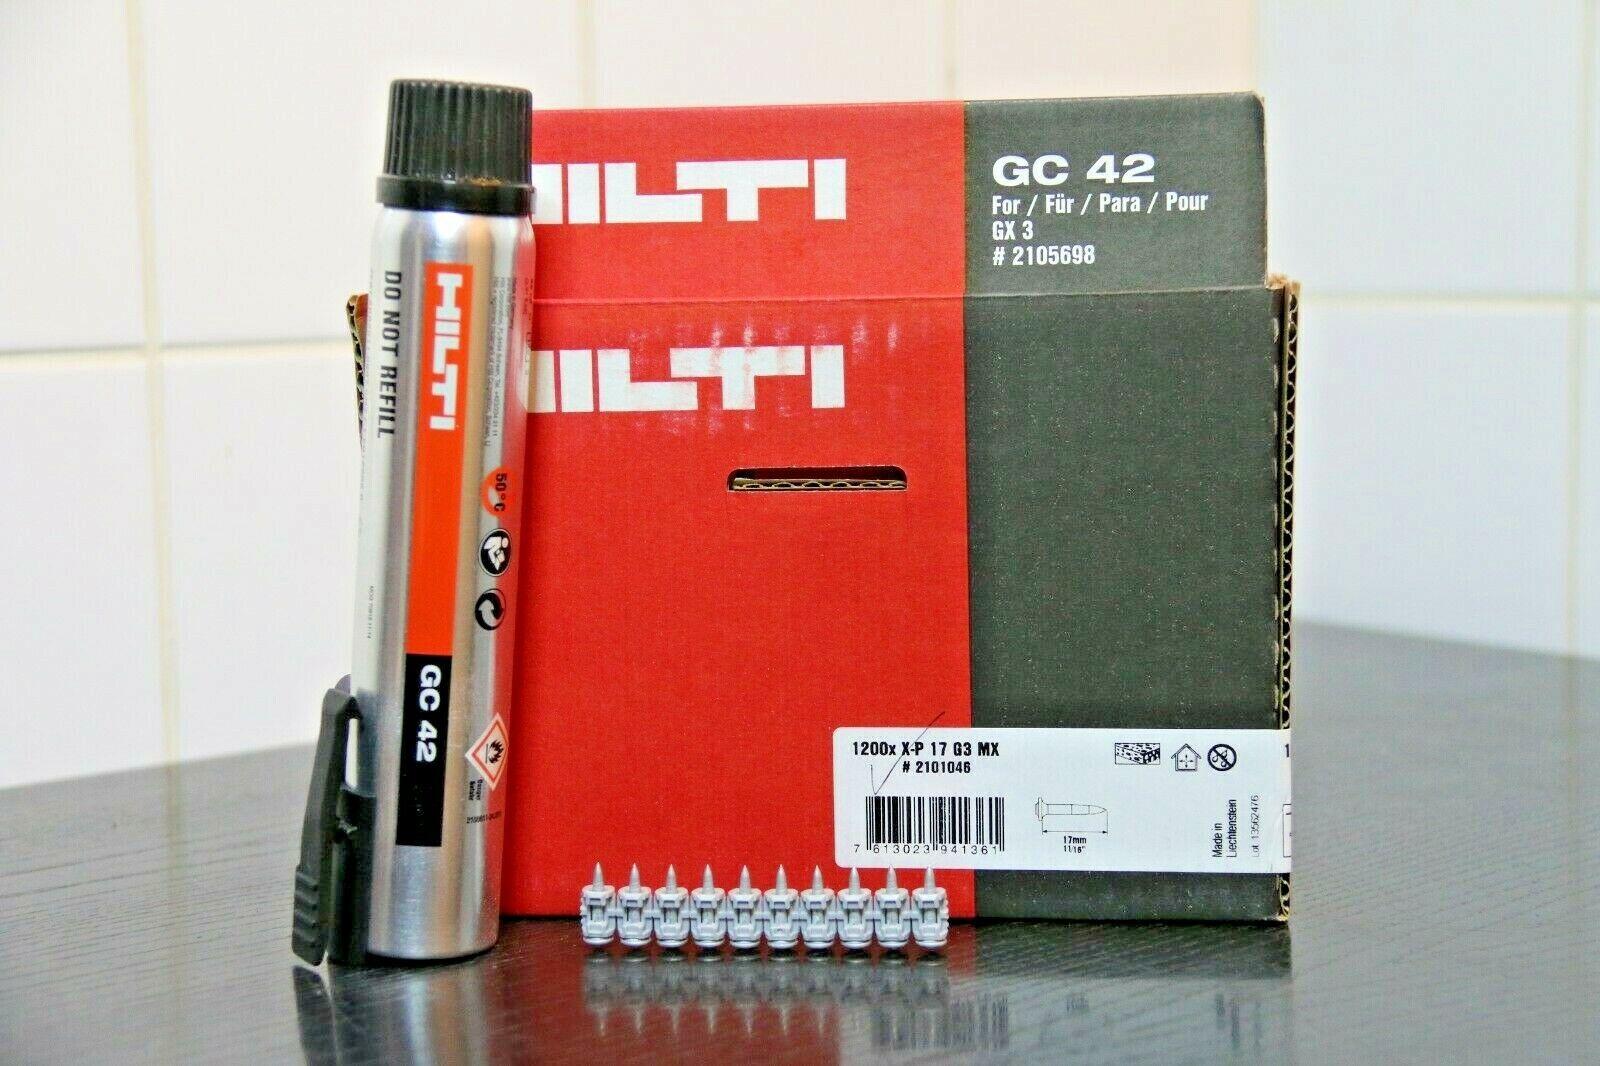 HILTI GX3 magaziniert UNIVERSAL NAGEL Nägel X-P 17 G3 MX 17mm + GC 42 Gas Beton